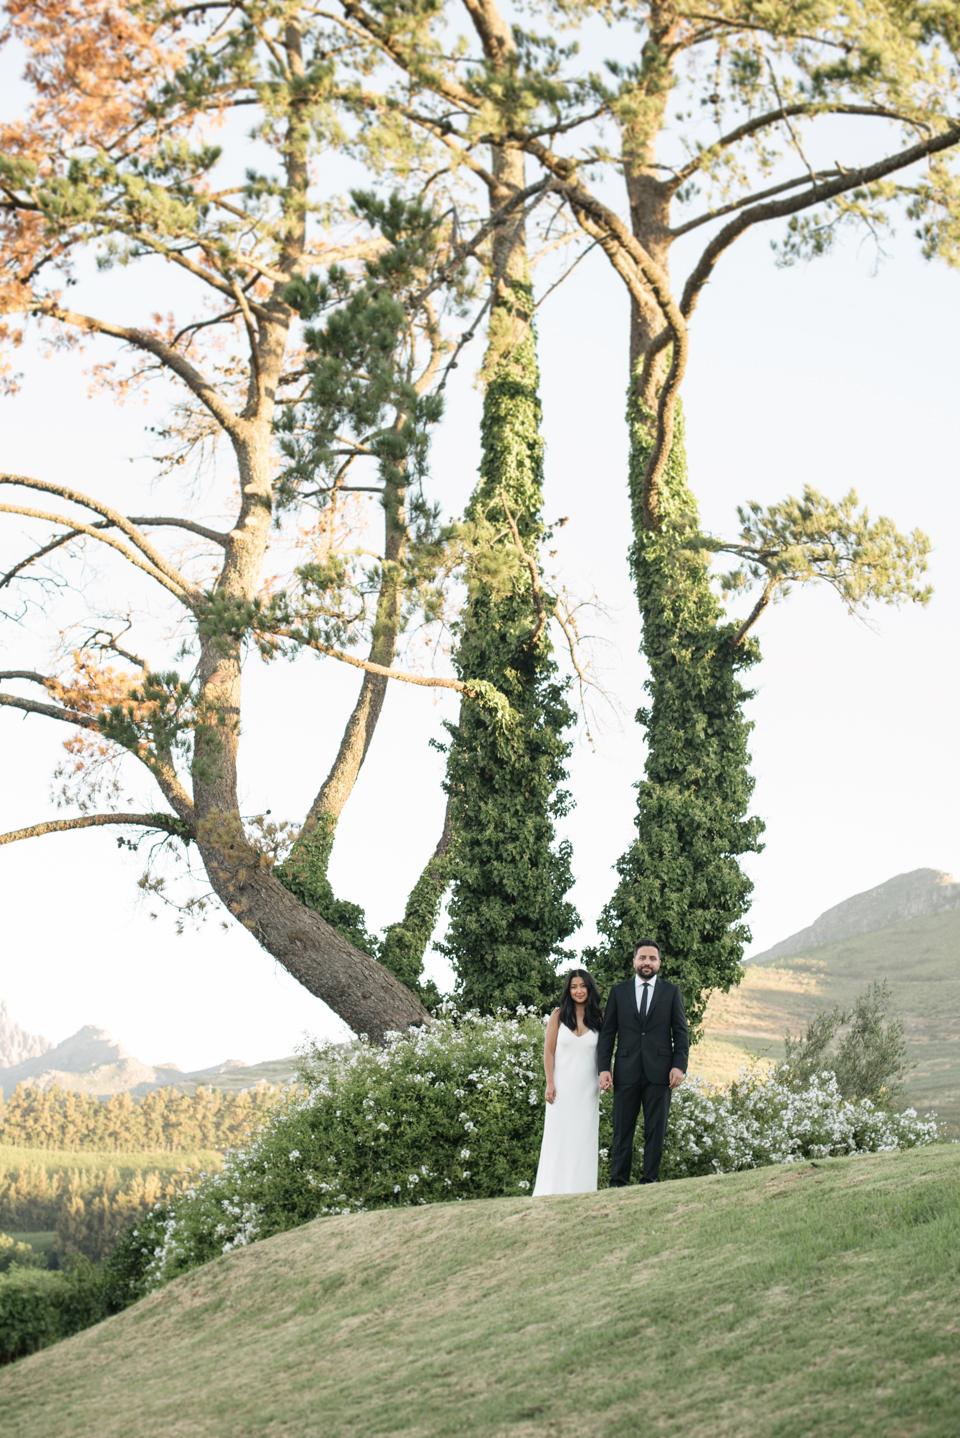 Grace and Alfonso wedding Clouds Estate Stellenbosch South Africa shot by dna photographers 769.jpg